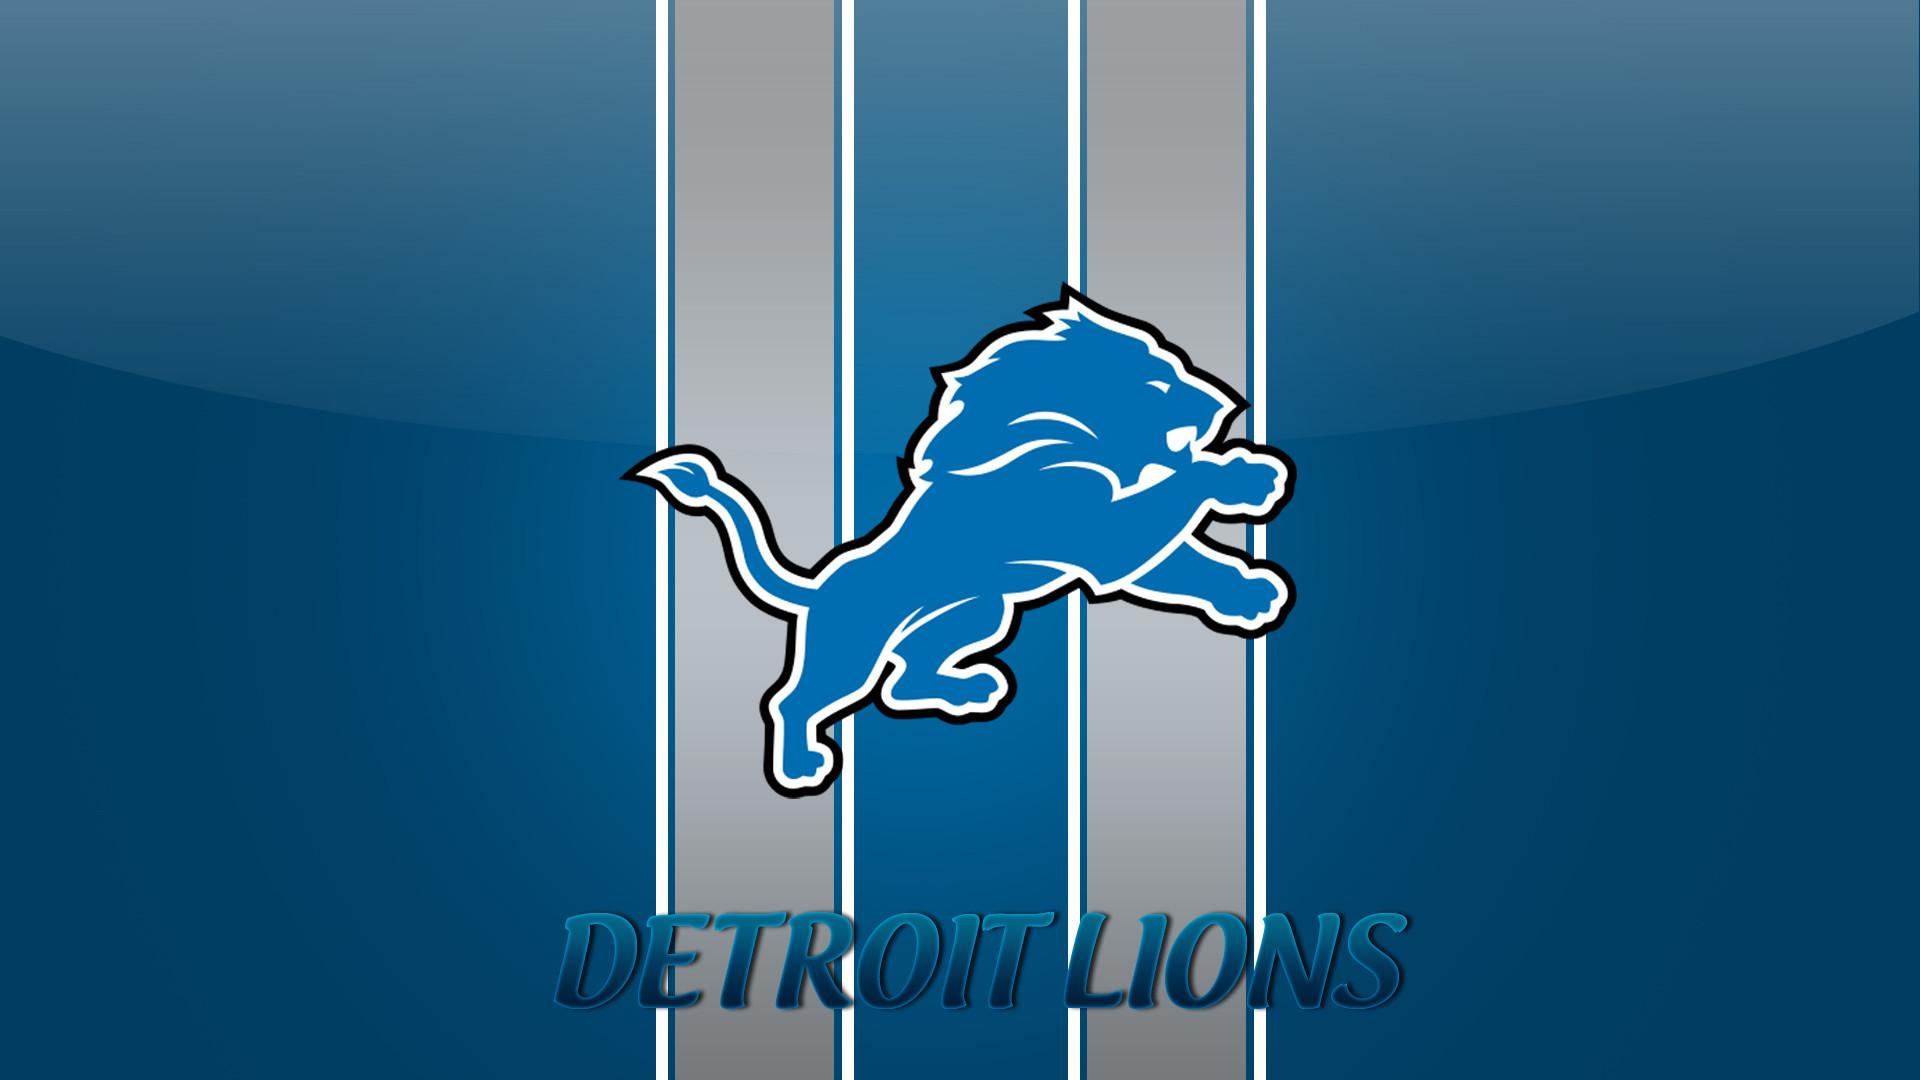 Detroit Lions Wallpaper | HD Wallpapers | Pinterest | Detroit lions  wallpaper, Lion wallpaper and Wallpaper